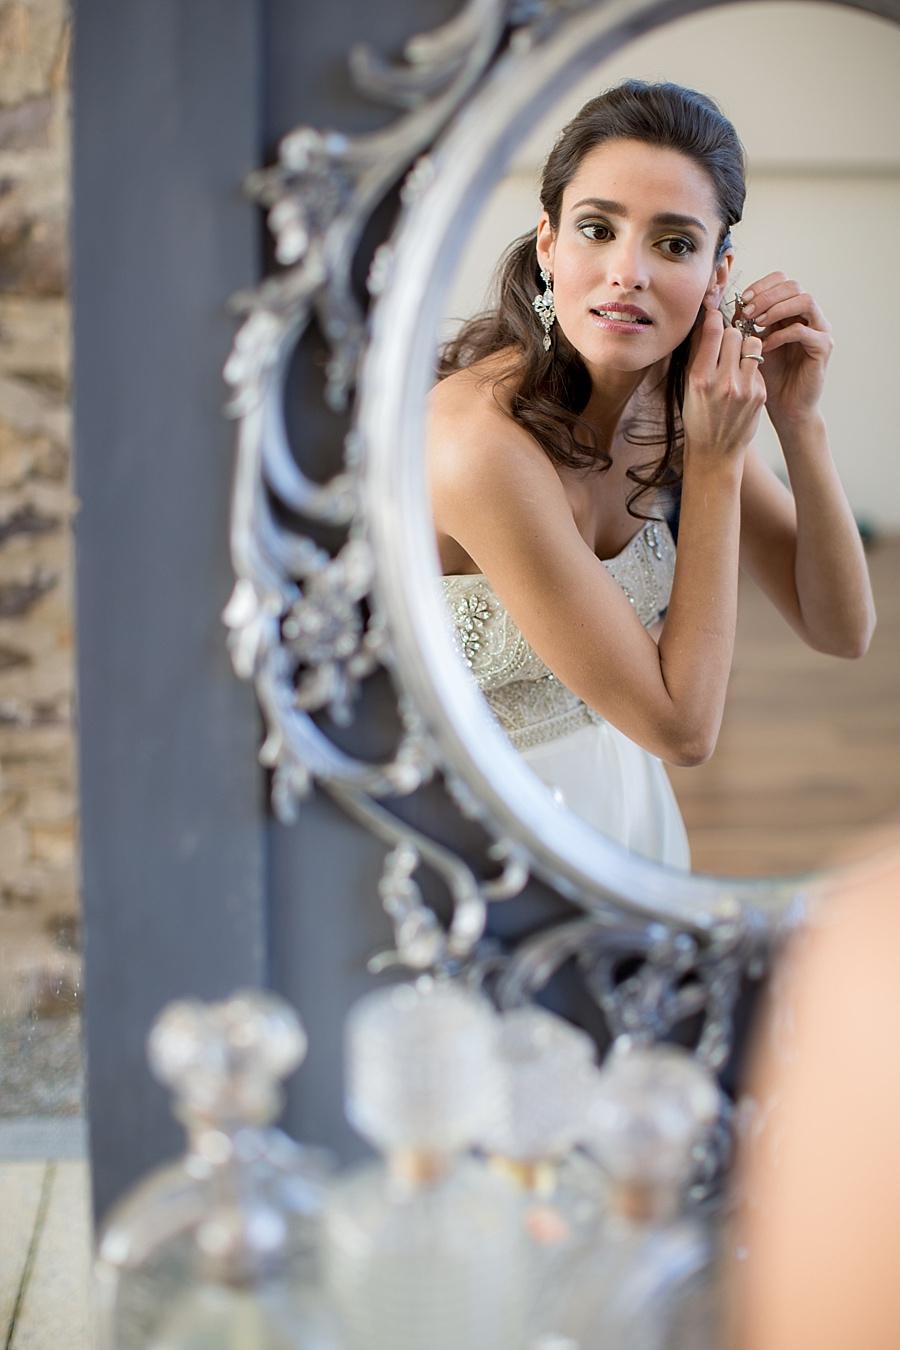 Vanessa_Joy_Photography_Details_of_I_do_Jean_Ralph_Thurin_Wedding_Gowns_April_Lynn_Designs_Wedding_Stationery15